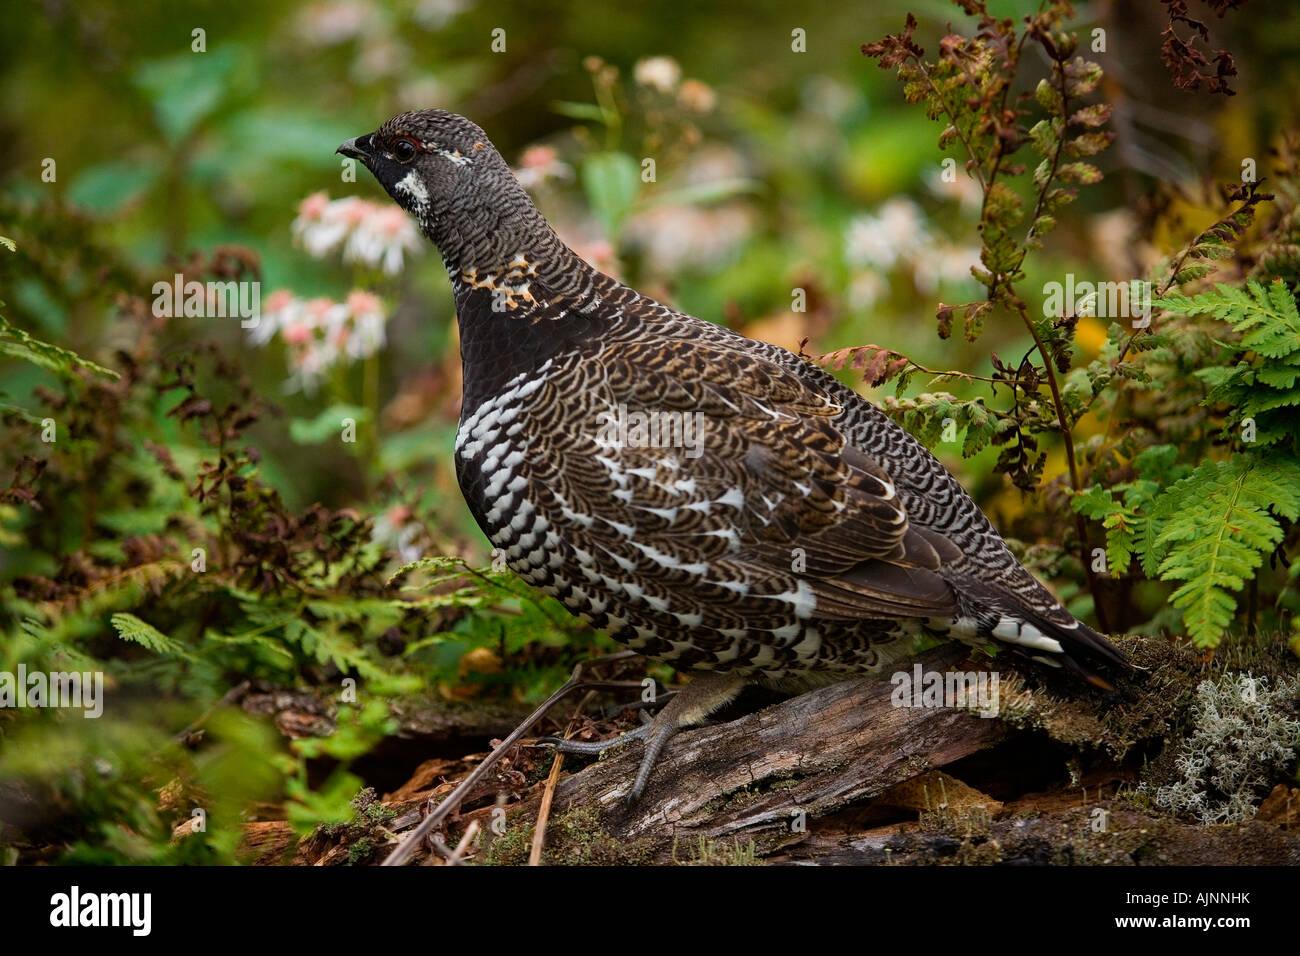 Spruce Grouse, (Falcipennis canadensis), Cape Breton Highlands National Park, Nova Scotia, Canada - Stock Image